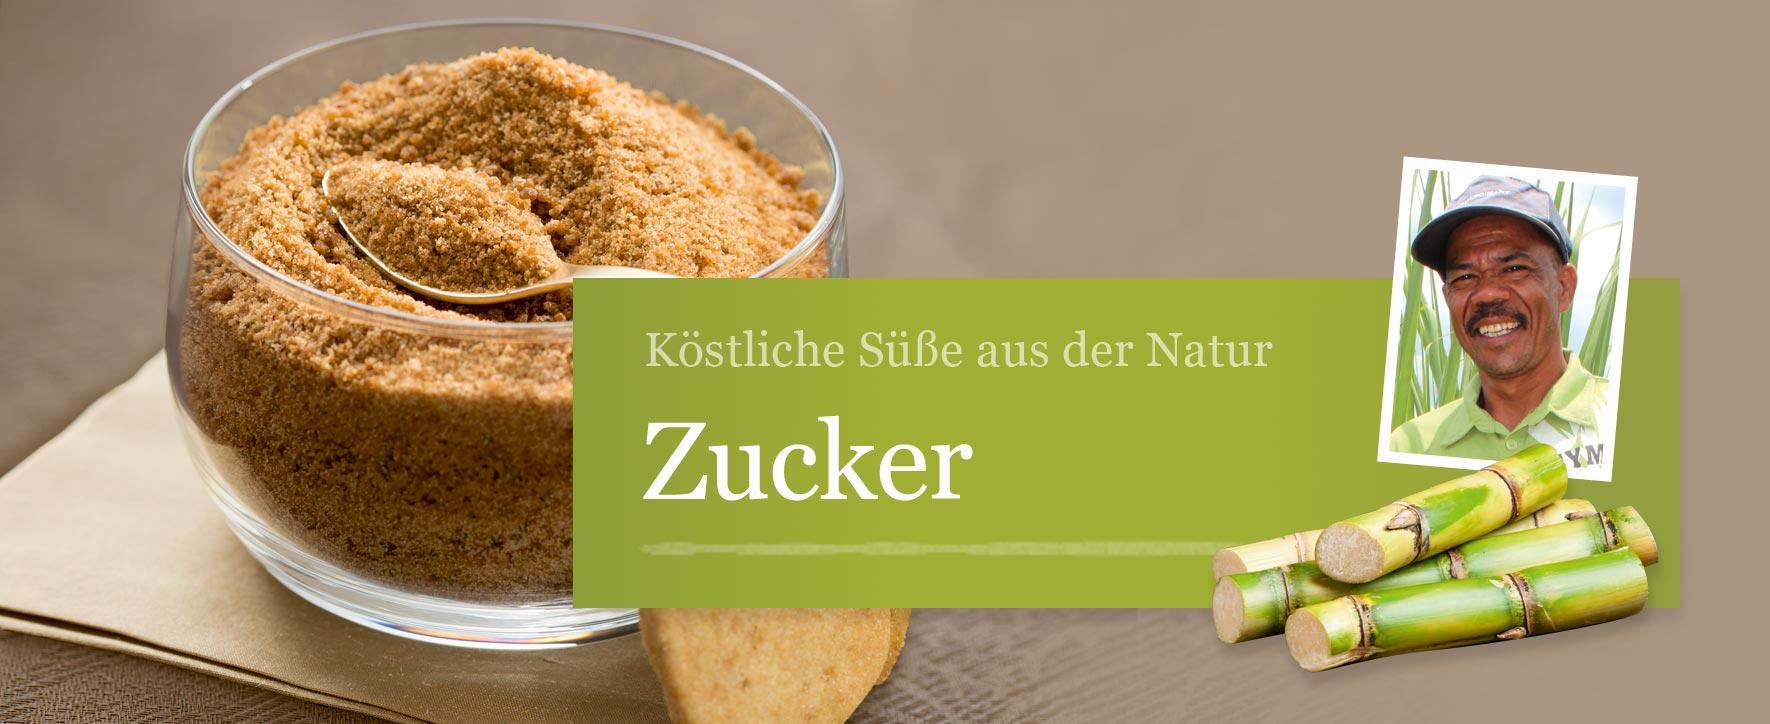 Zucker - Foto: GEPA - The Fair Trade Company / Sandra Eckhardt Fotografie